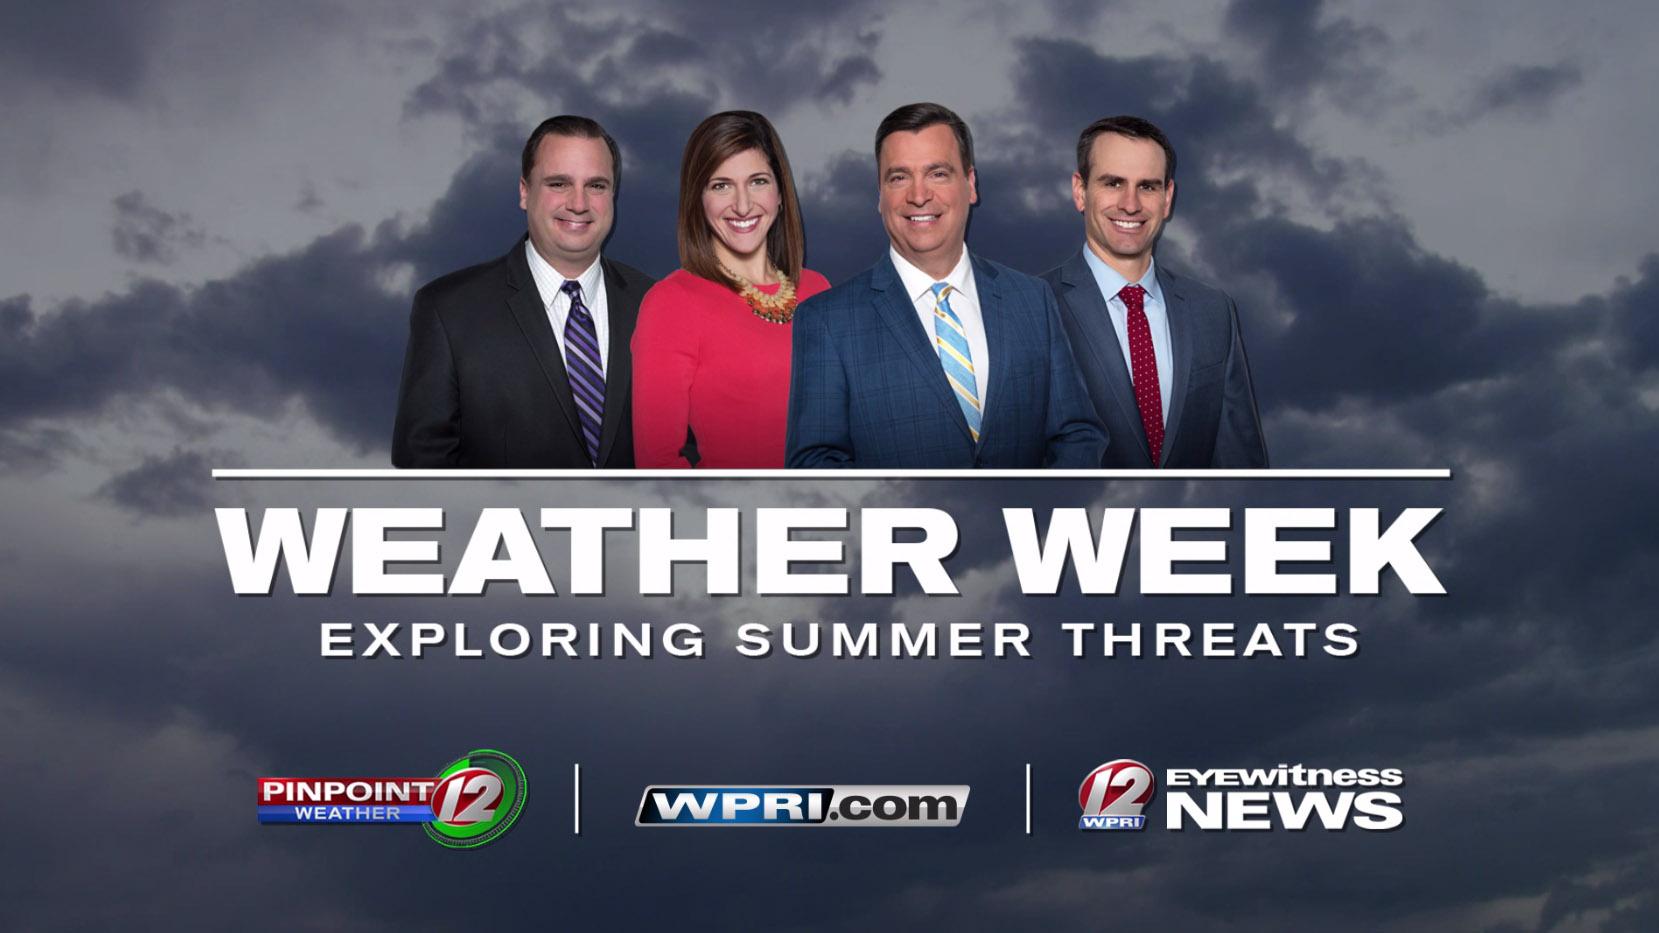 Weather Week: Exploring Summer Threats on WPRI.com